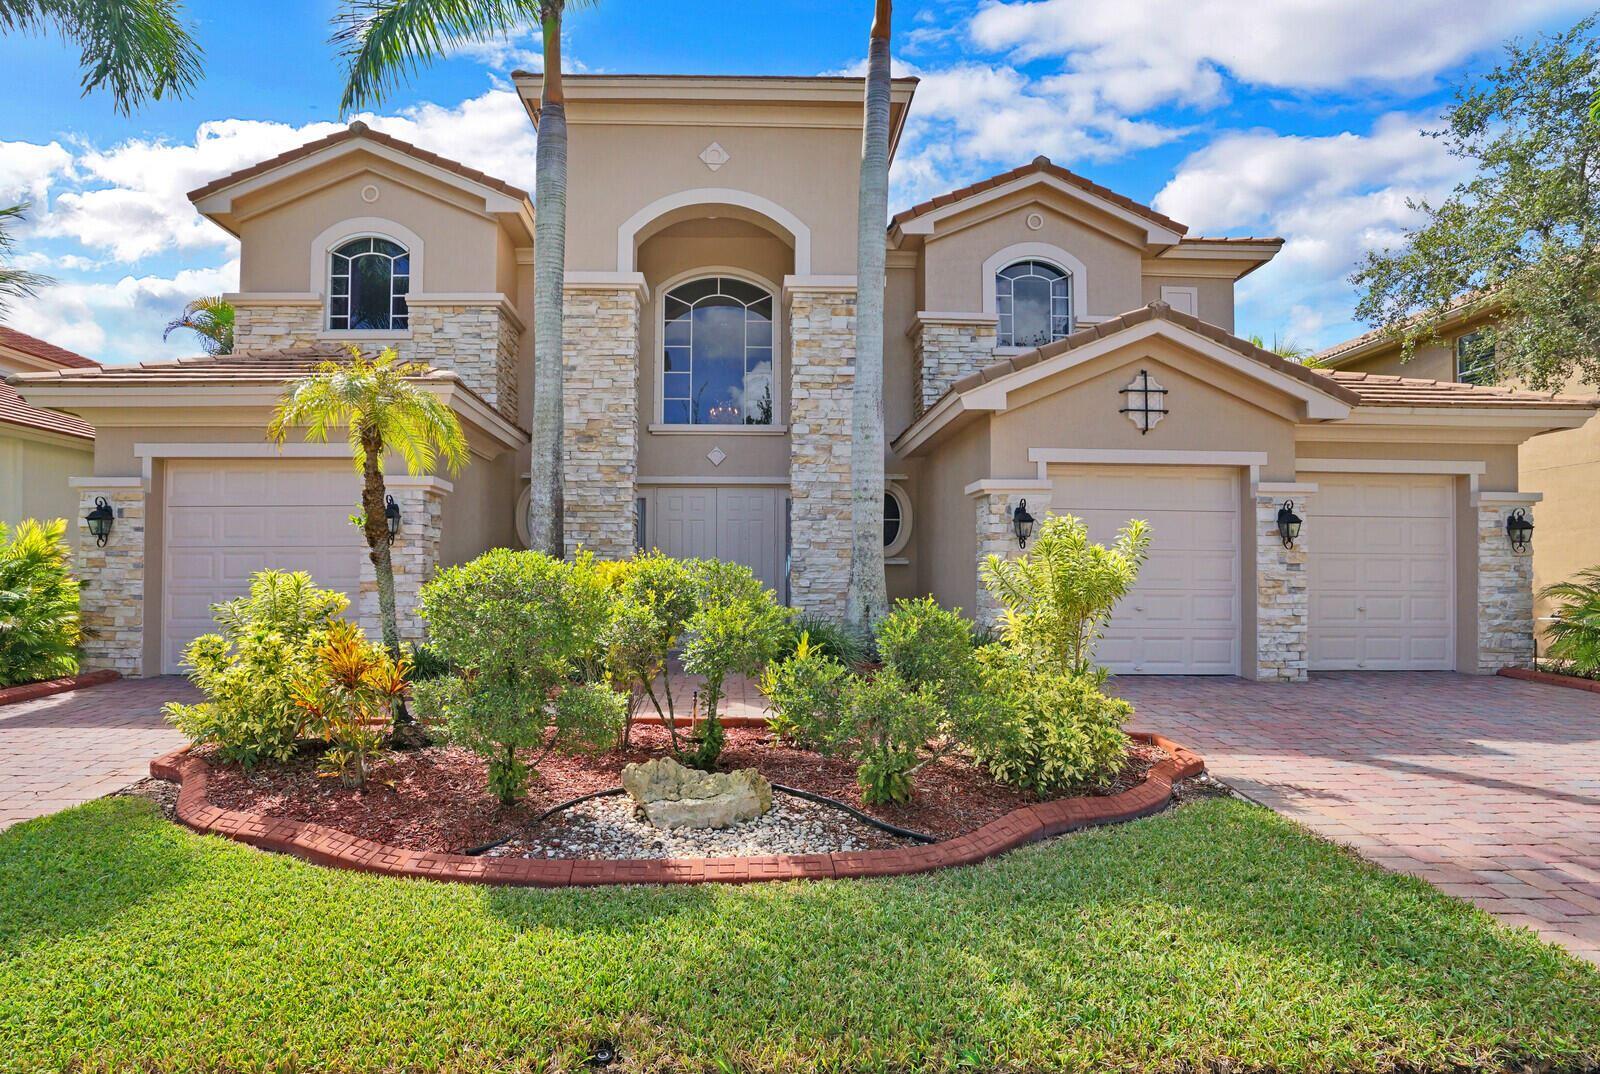 8736 Wellington View Drive, West Palm Beach, FL 33411 - MLS#: RX-10746149